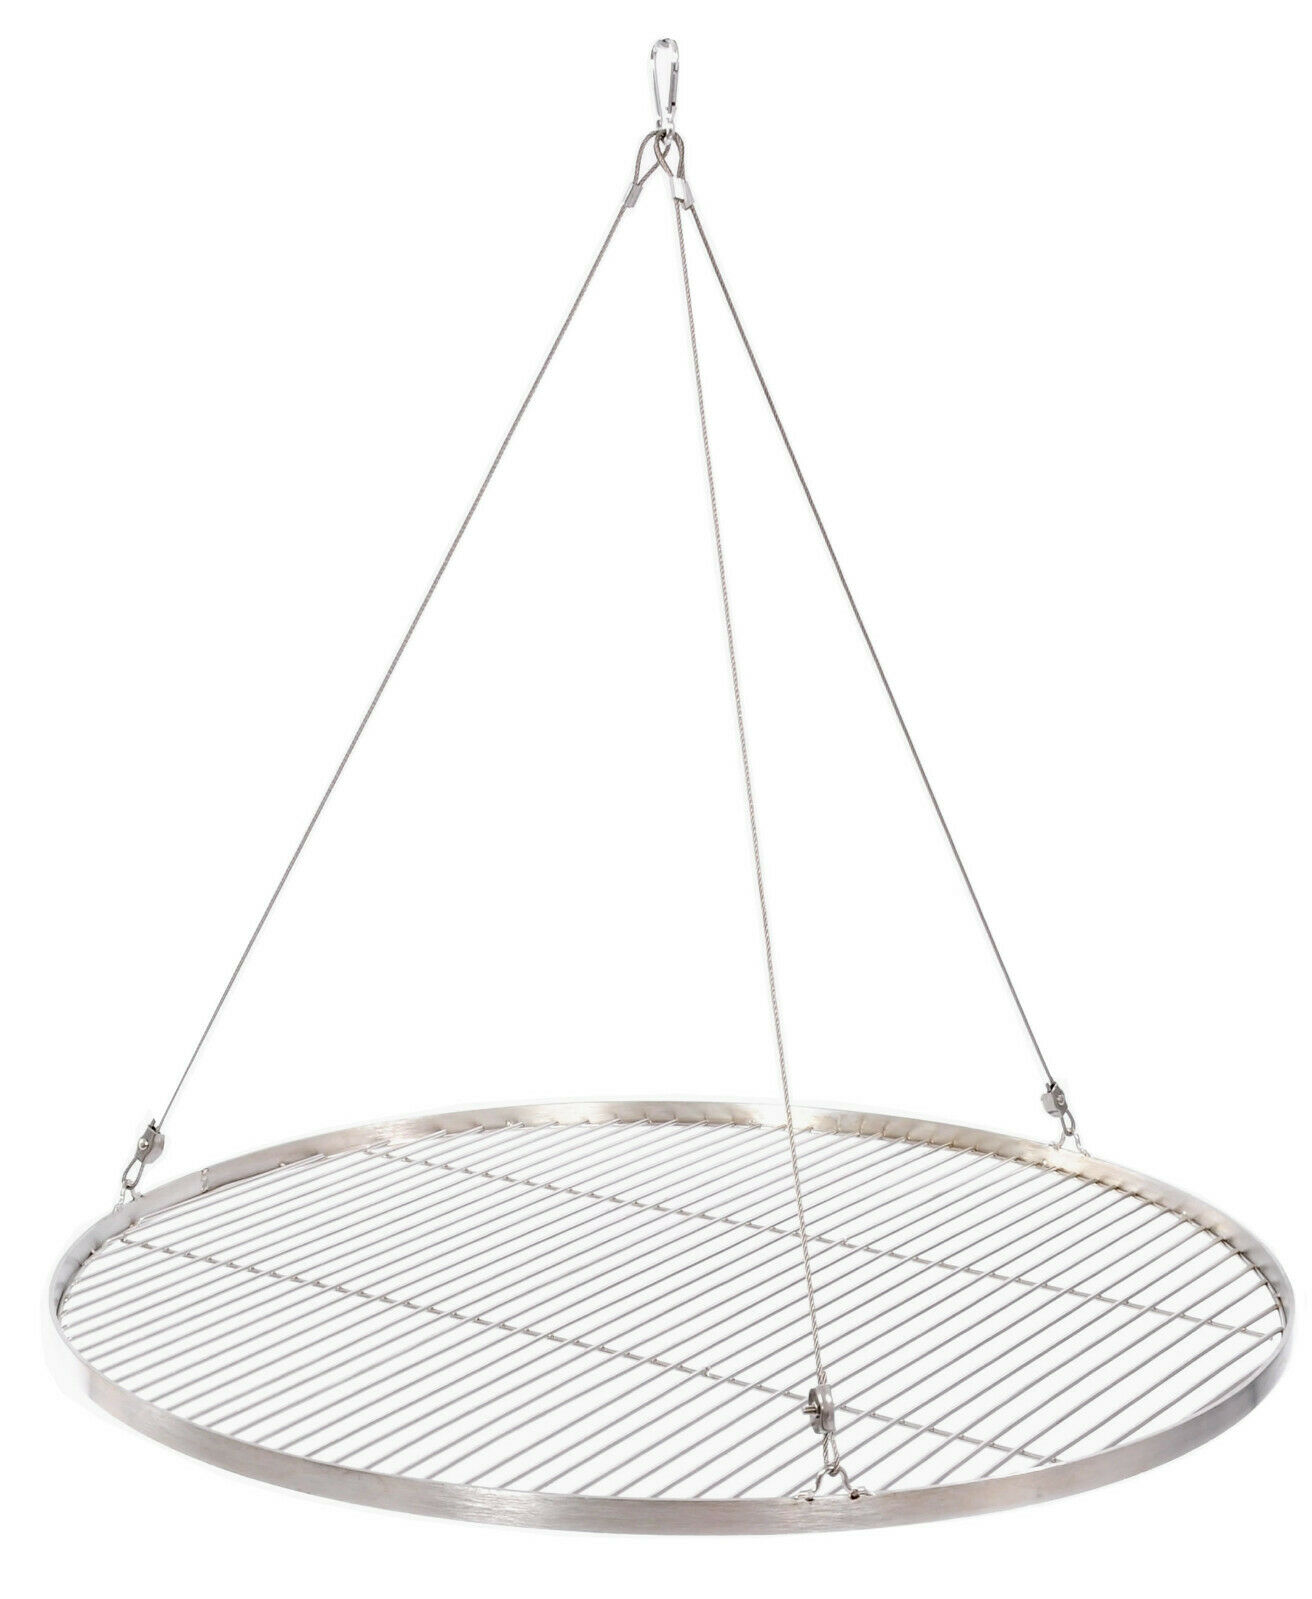 Grillrost Edelstahl 14 mm mit Seil 20 30 40 45 47 50 55 57 60 65 70 75 80 cm